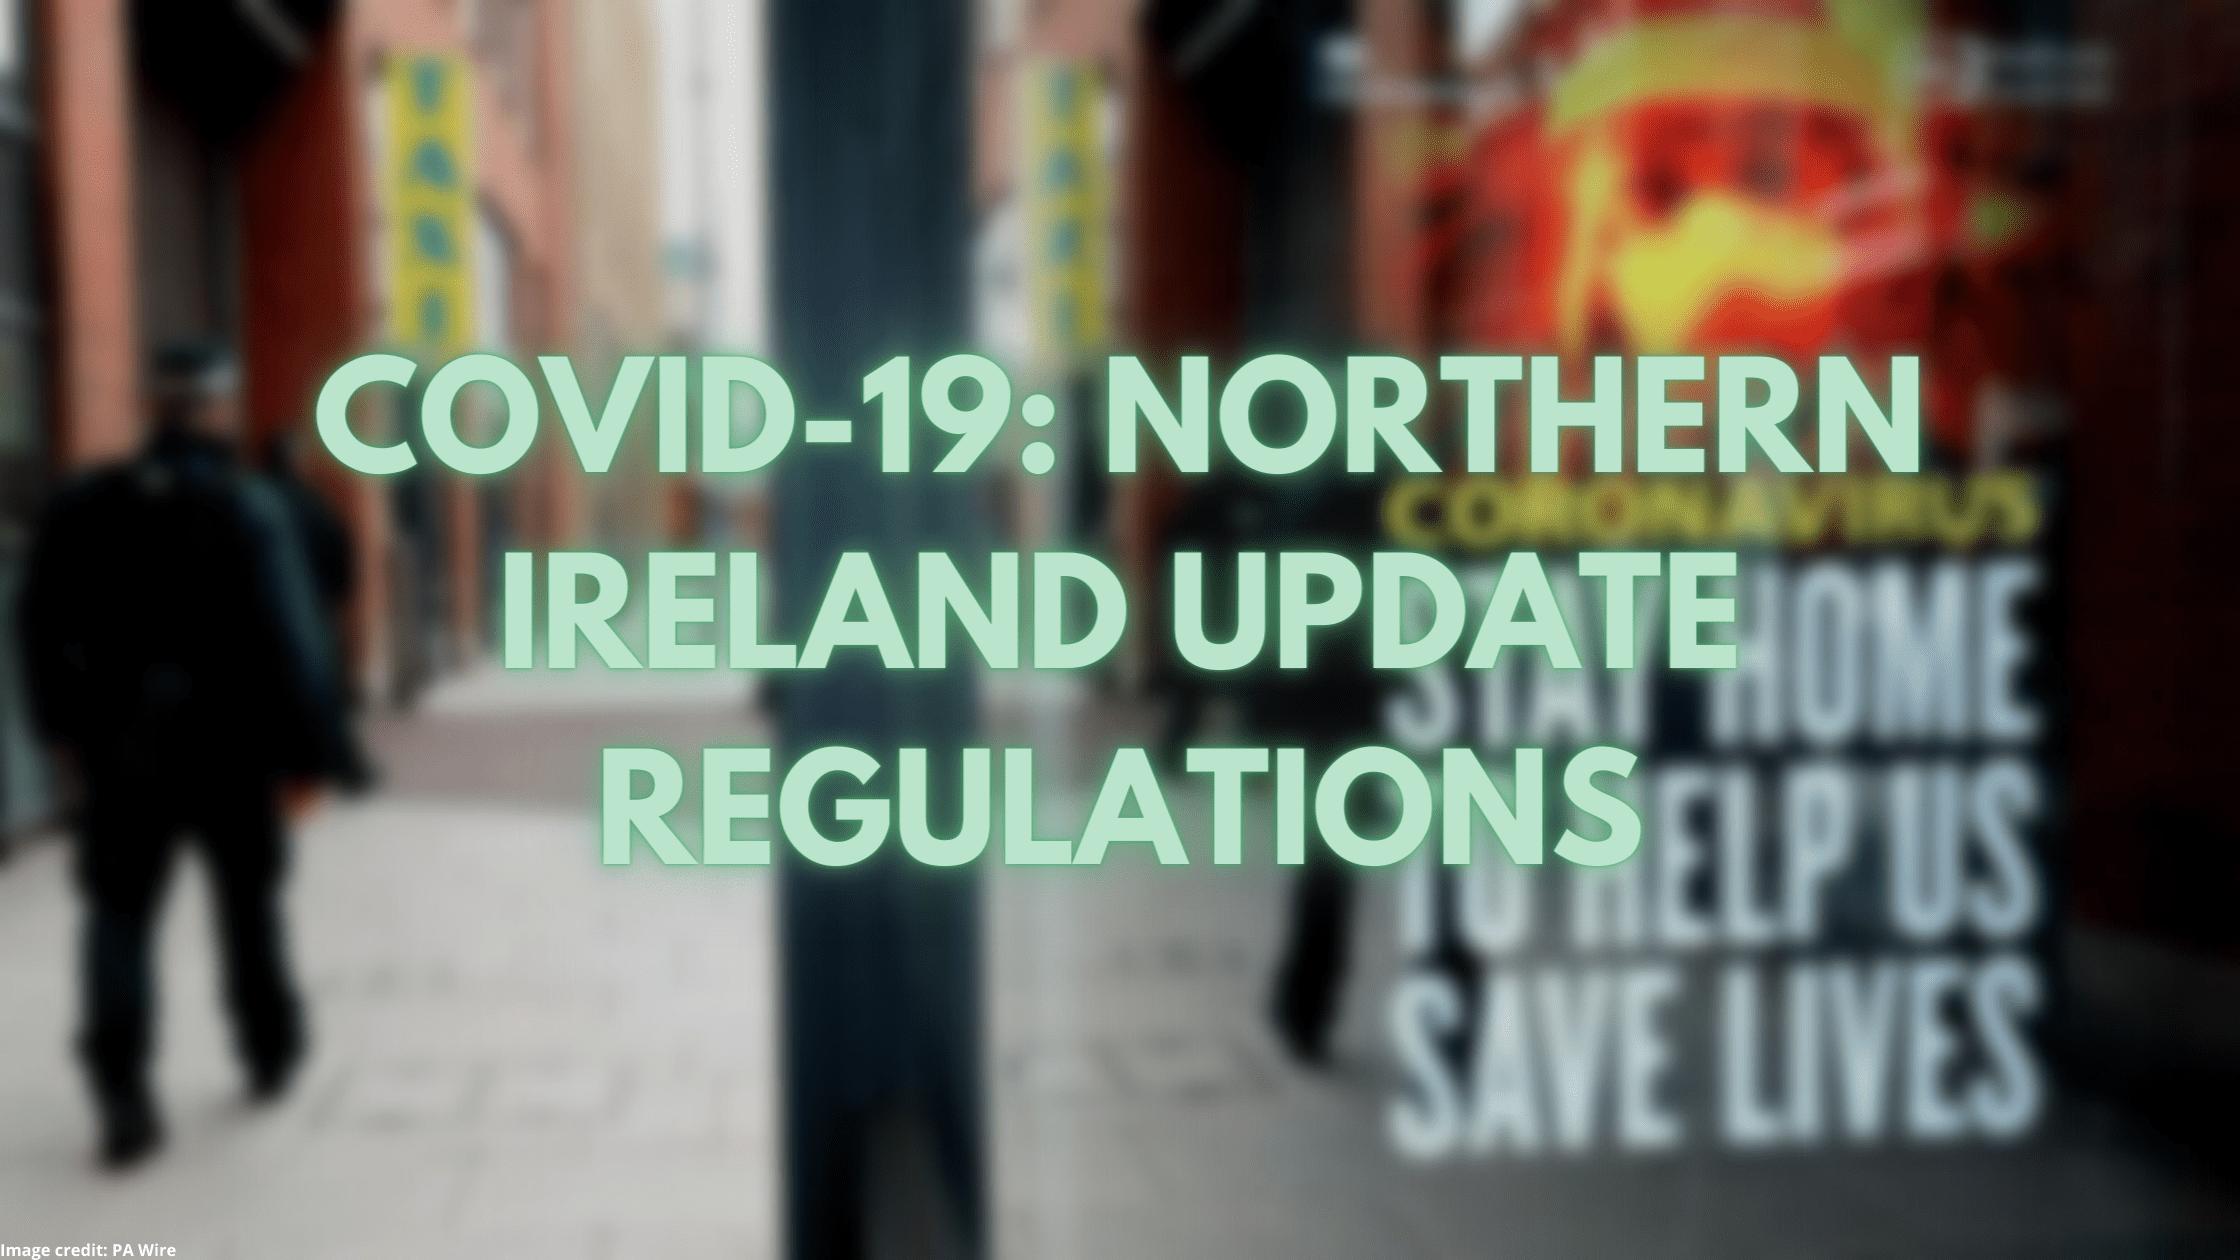 COVID-19: Northern Ireland Updates